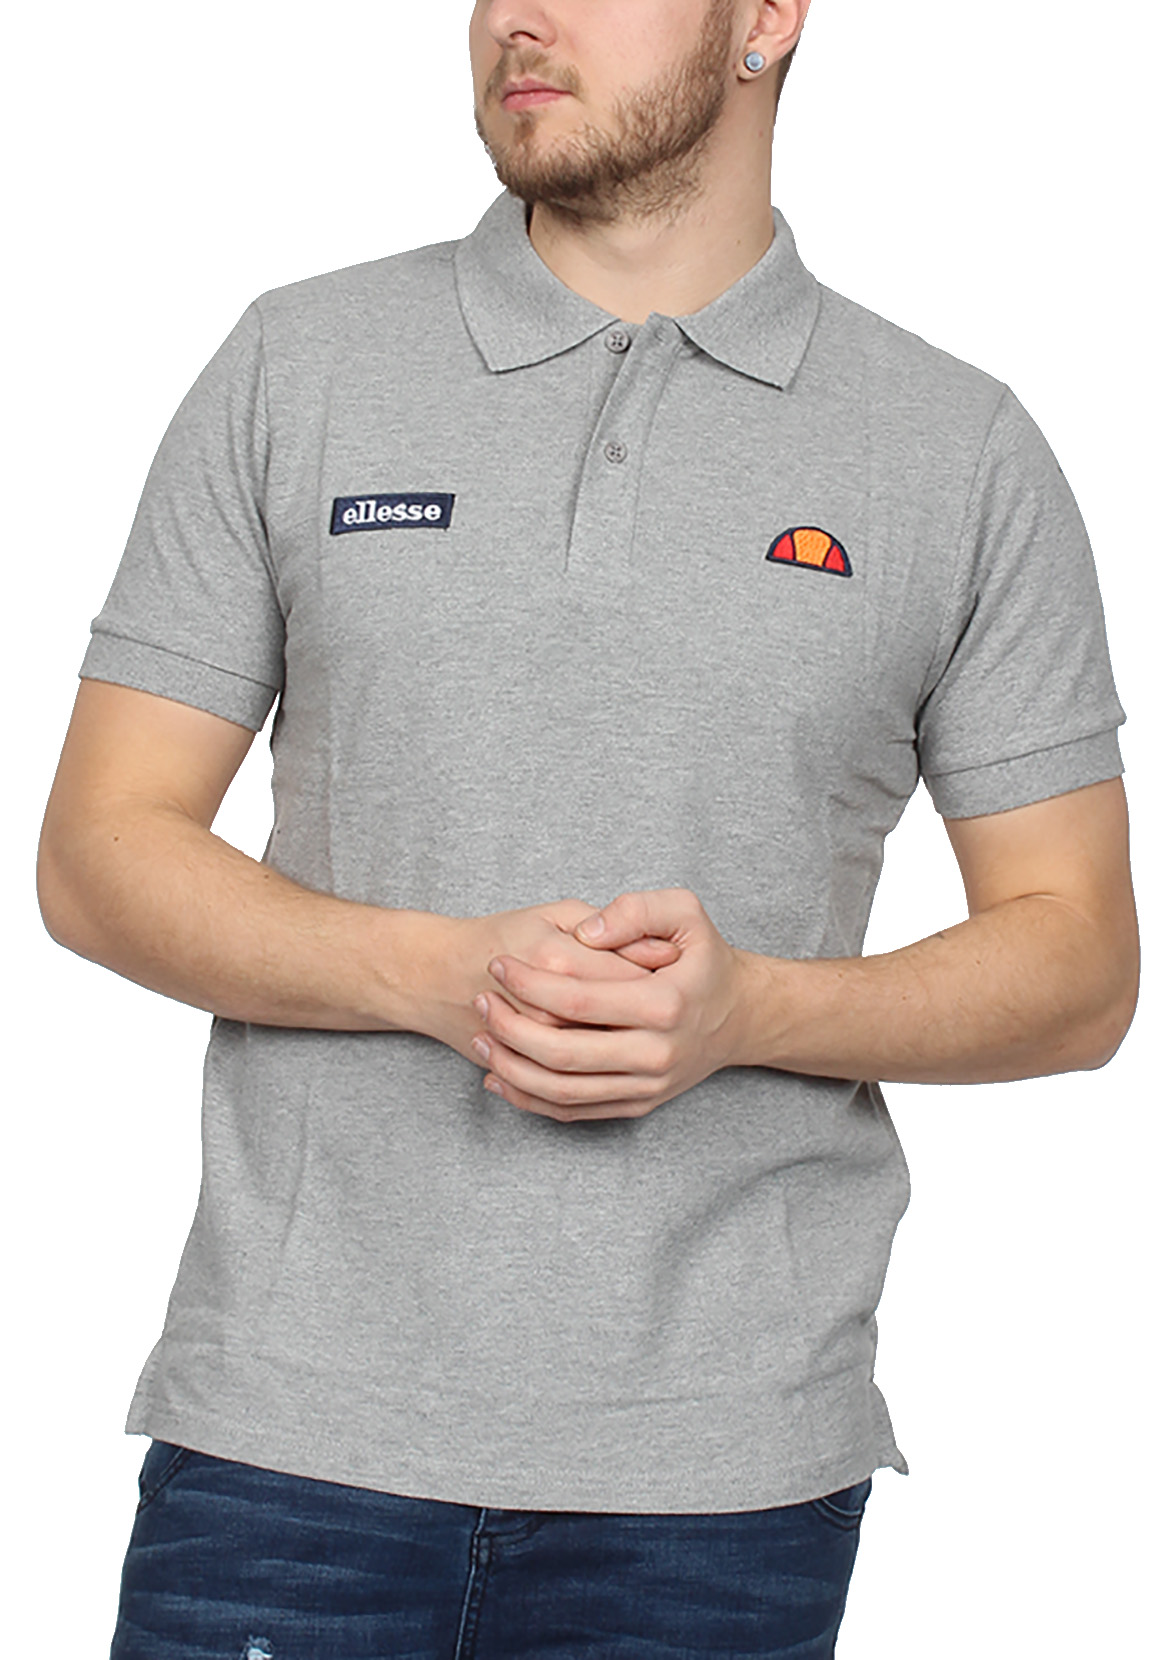 Ellesse Poloshirt Herren MONTURA POLO Grau Athletic Grey Marl